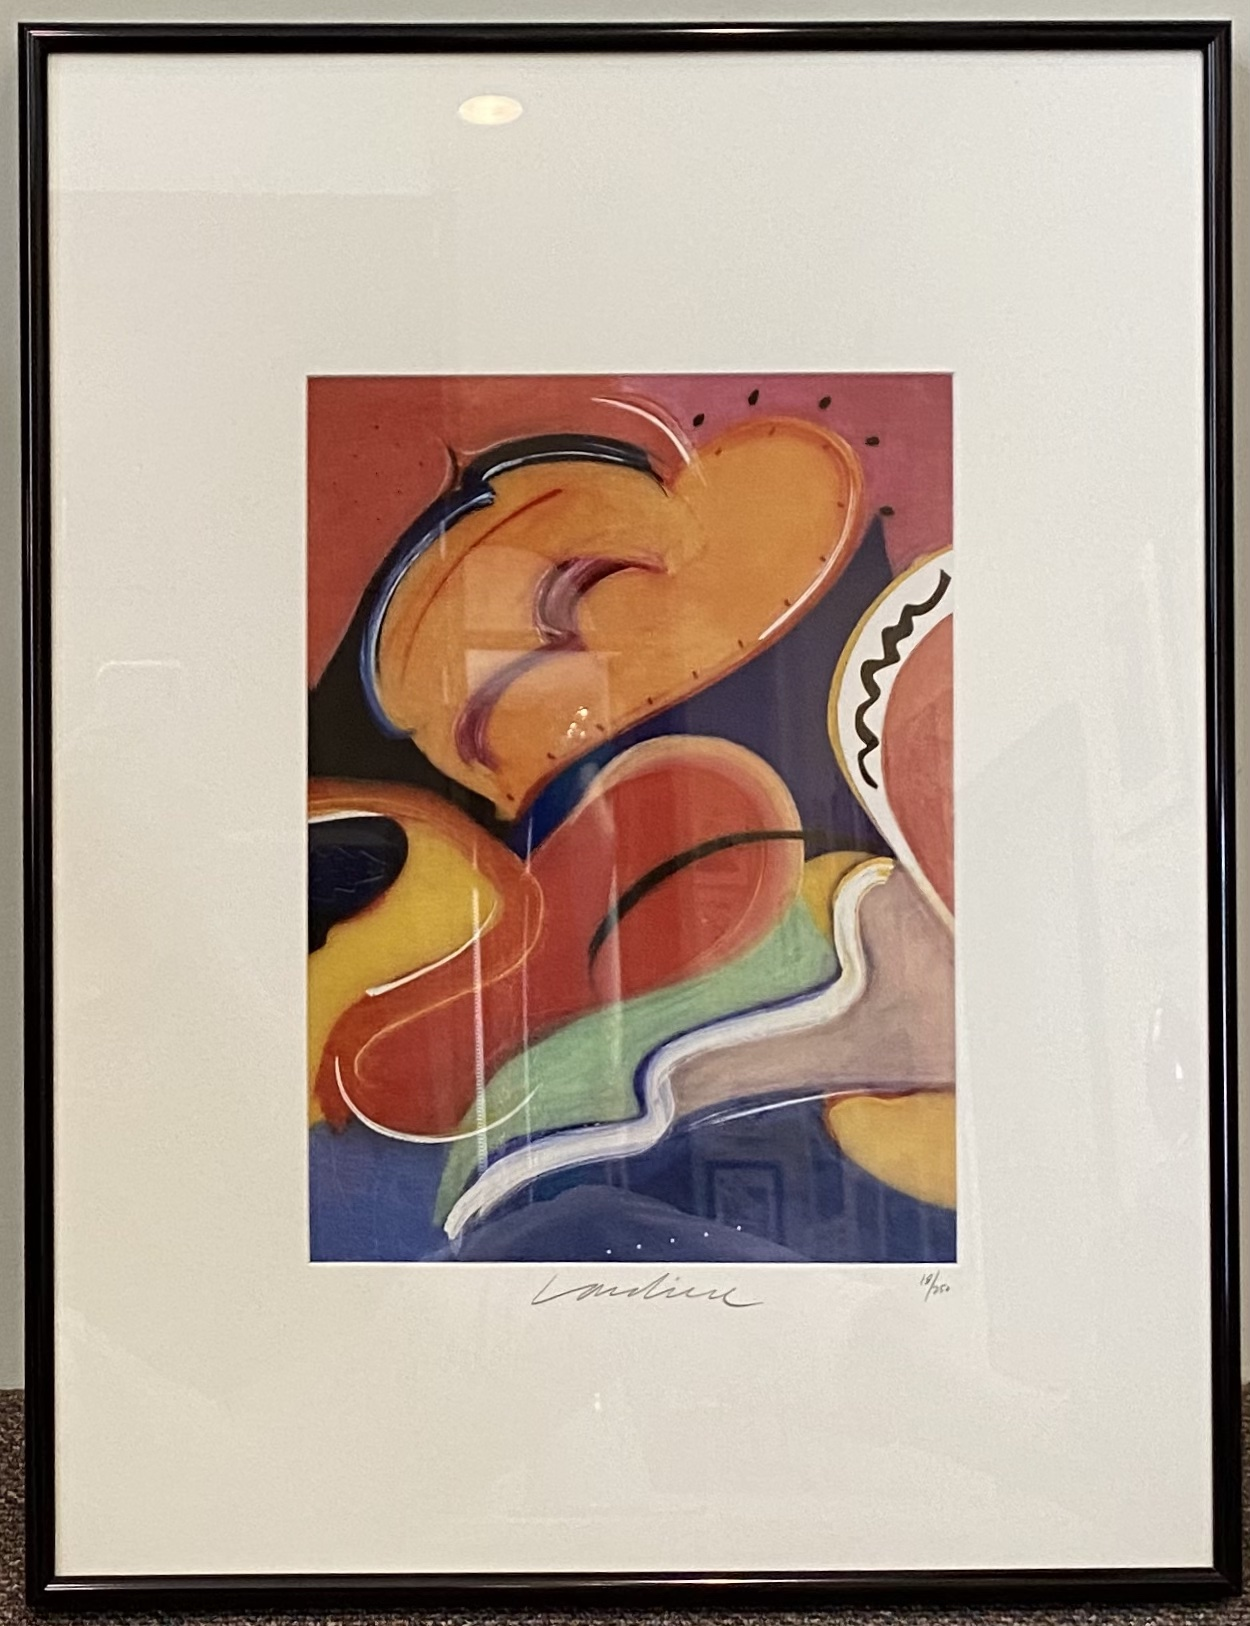 "Geoffrey Lardiere Sea of Dreams Lithograph 11"" X 15"" $365."